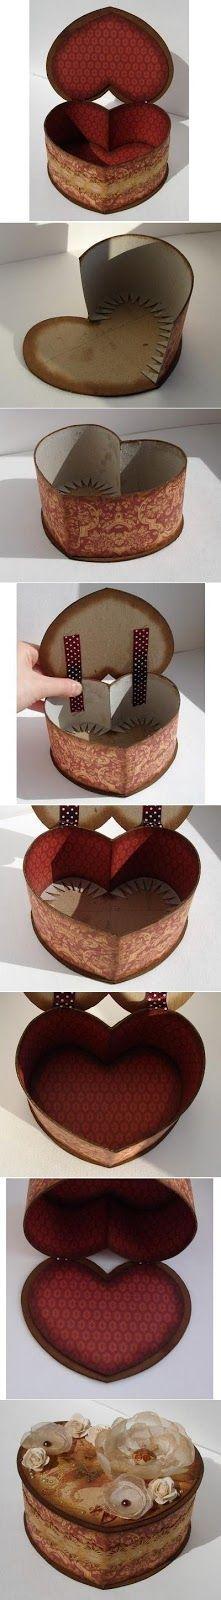 decorative packaging DIY